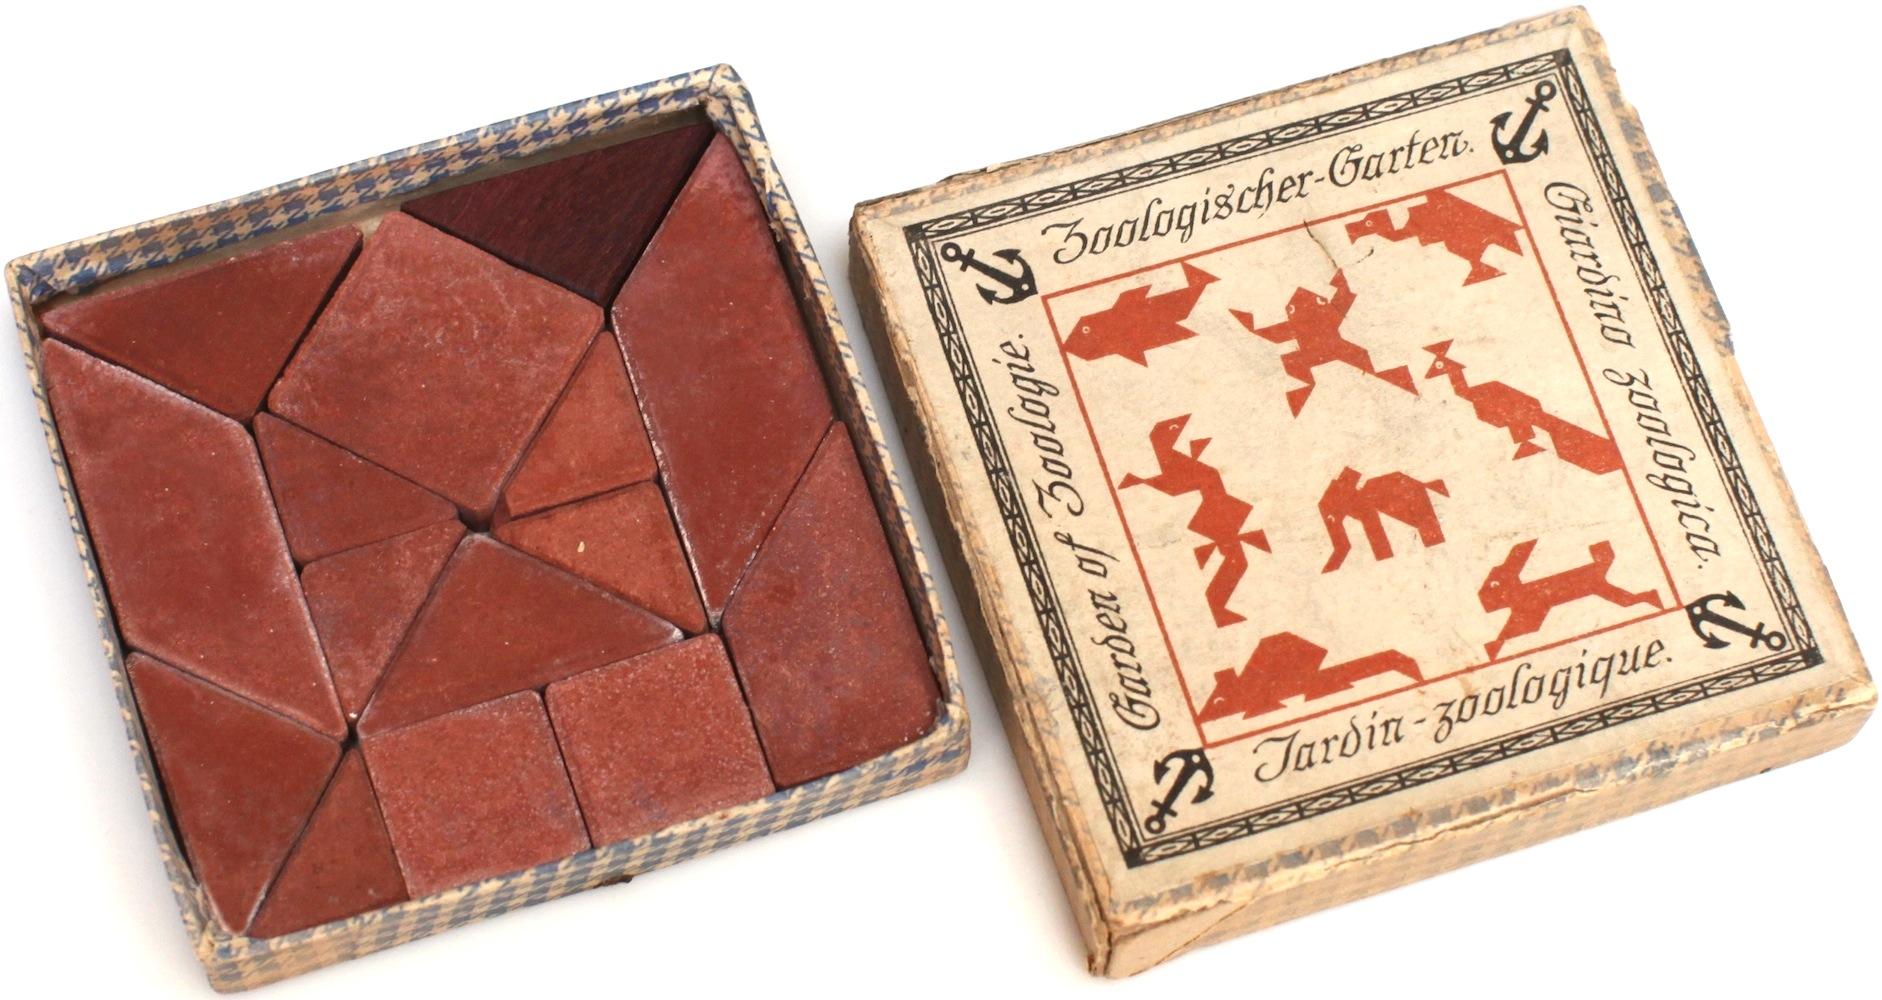 Richter Garten richter trench and zoo puzzles (a.k.a. schutzengraben, zoologischer